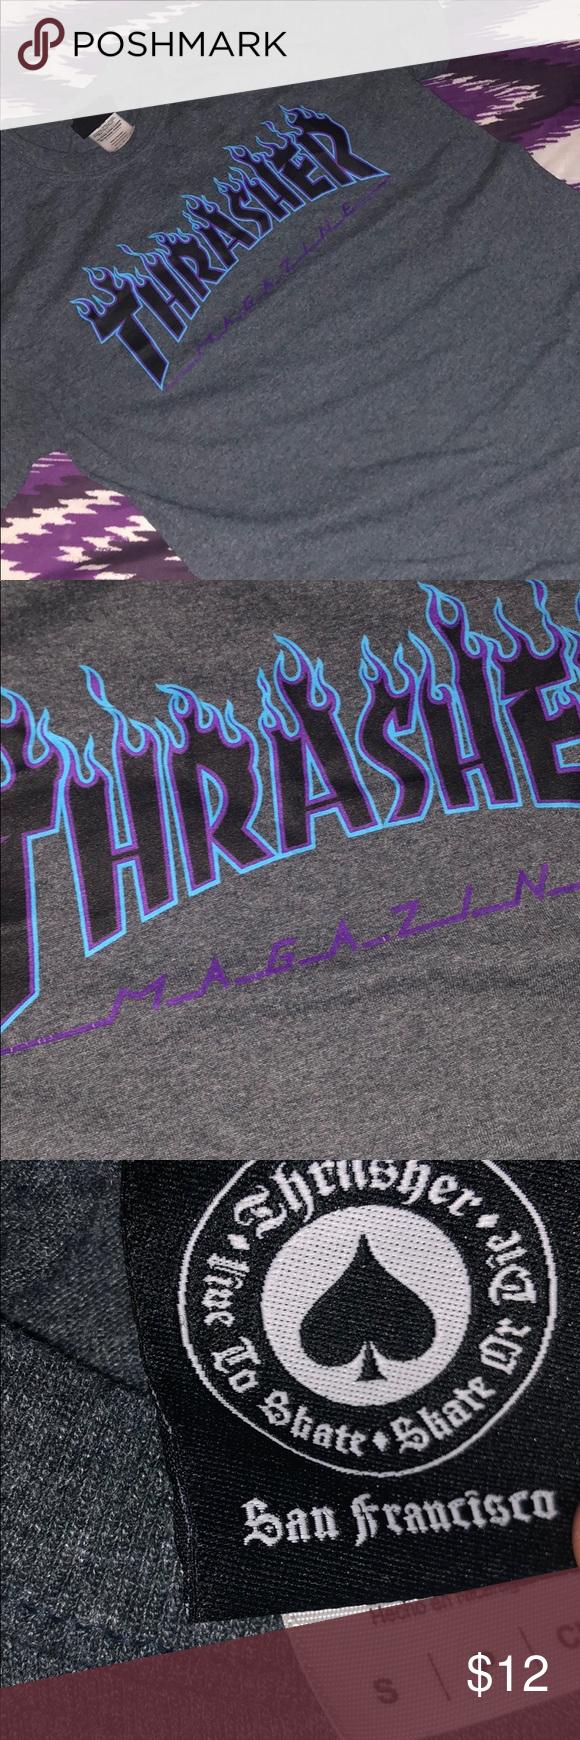 ed3b37ef6d32 Thrasher Flame Logo T-Shirt black